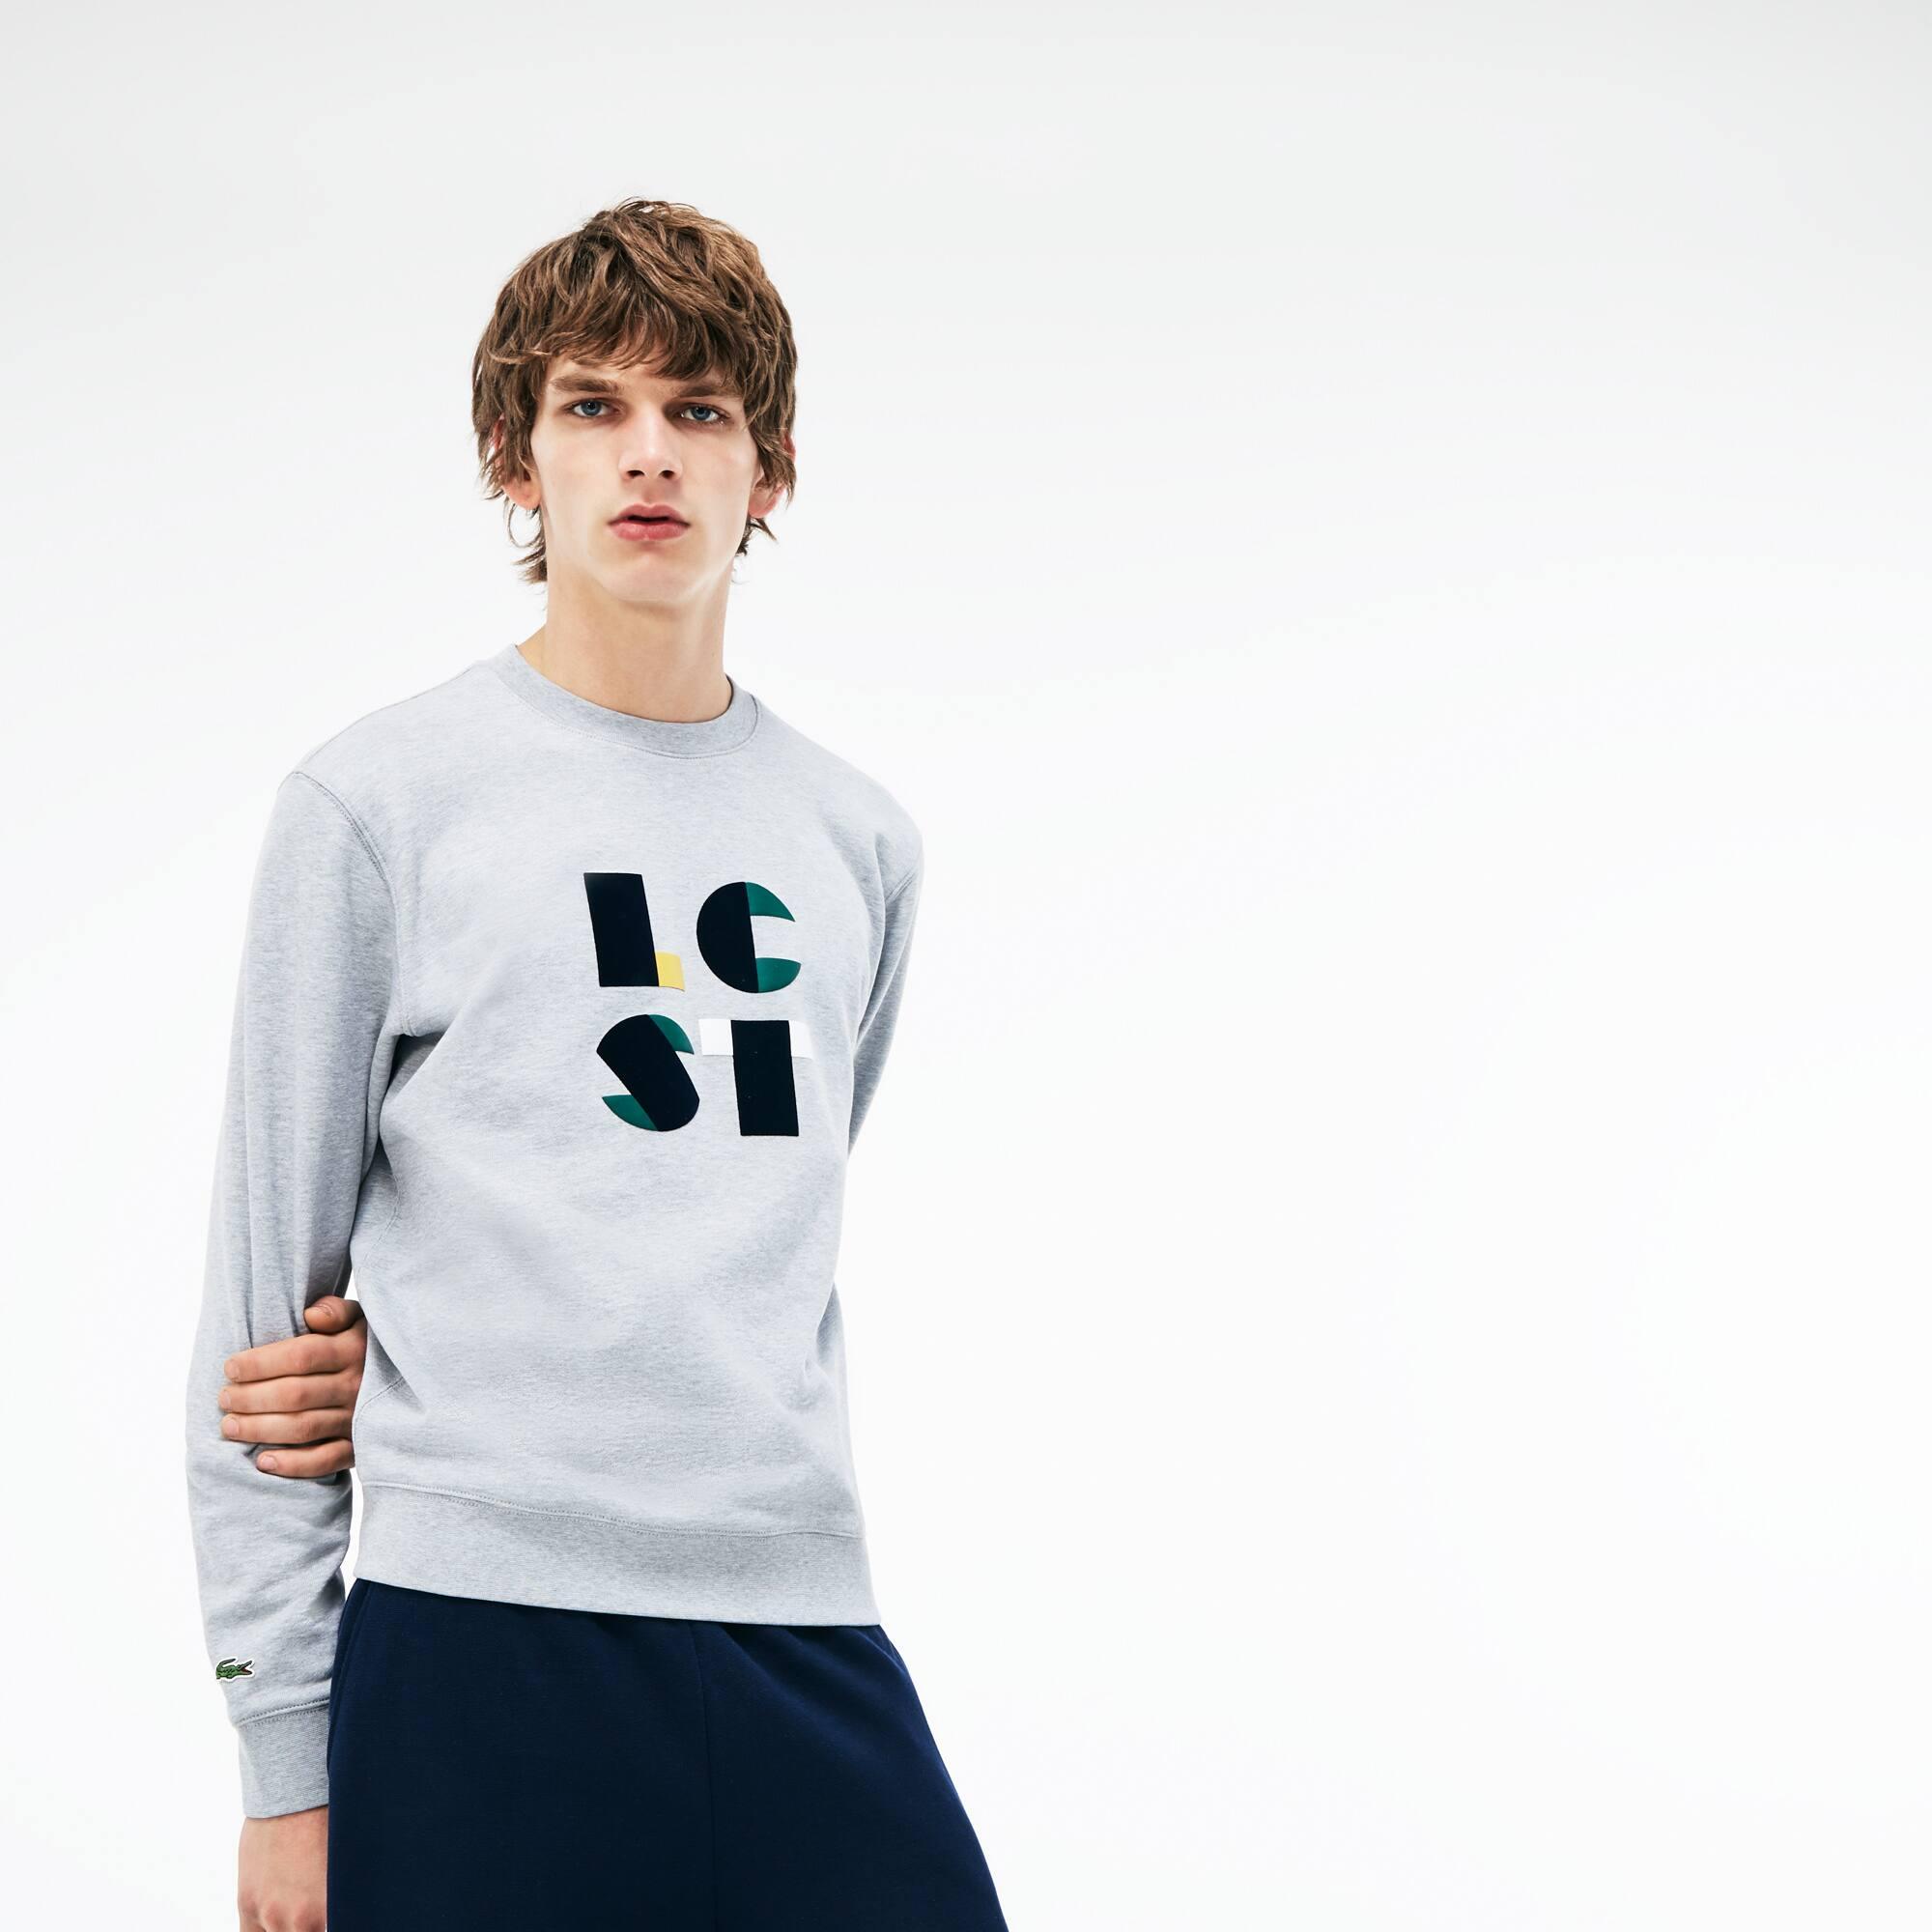 Sweatshirt col rond en molleton de coton avec marquage Lacoste